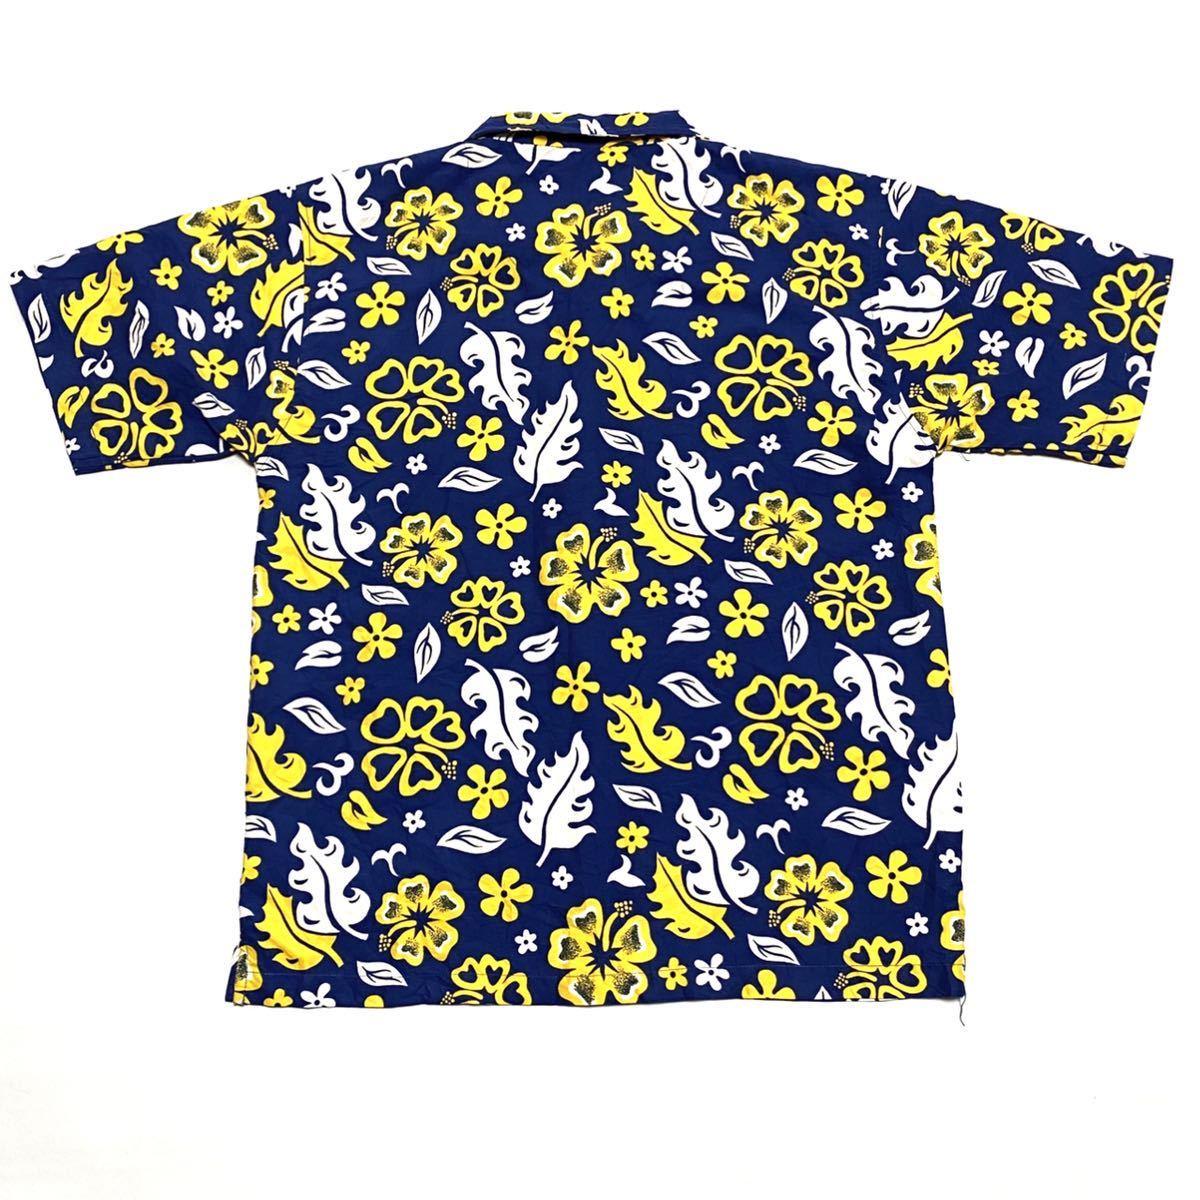 XL相当 liquid アロハシャツ メンズ 花柄 ハイビスカス 即決 ハワイアン シャツ 古着 アメリカ古着